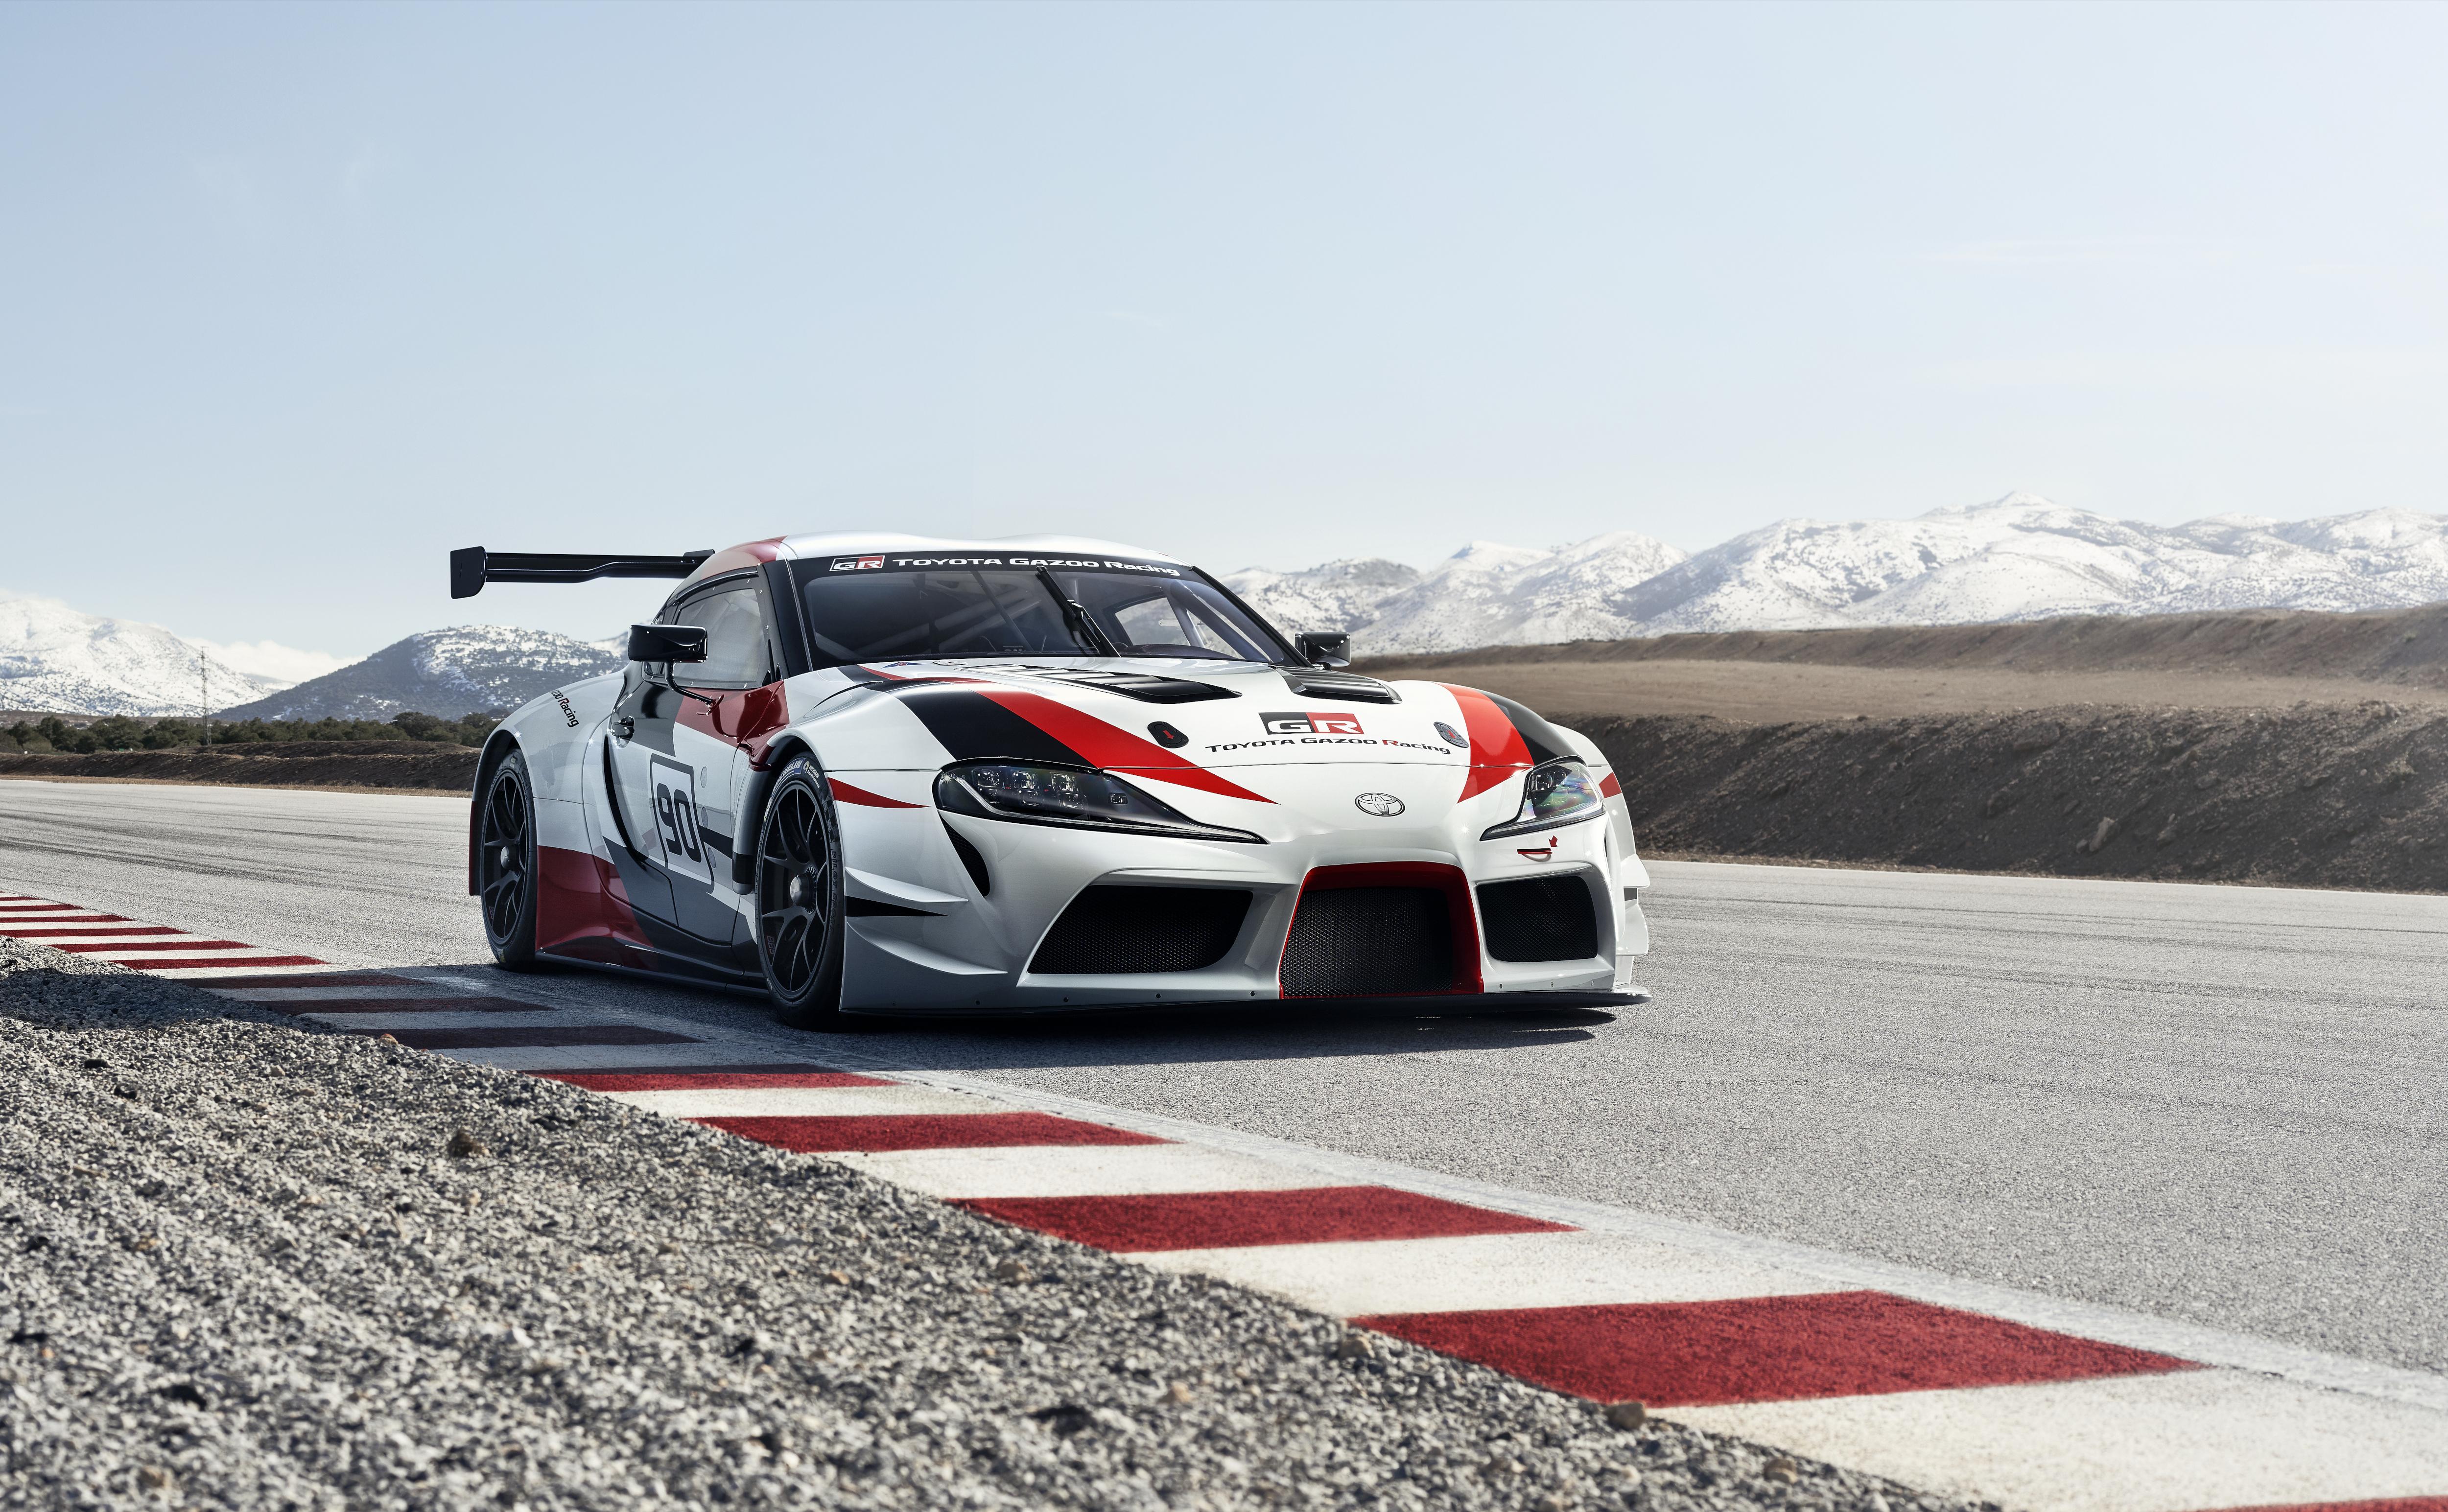 2018 Toyota Supra racing concept.